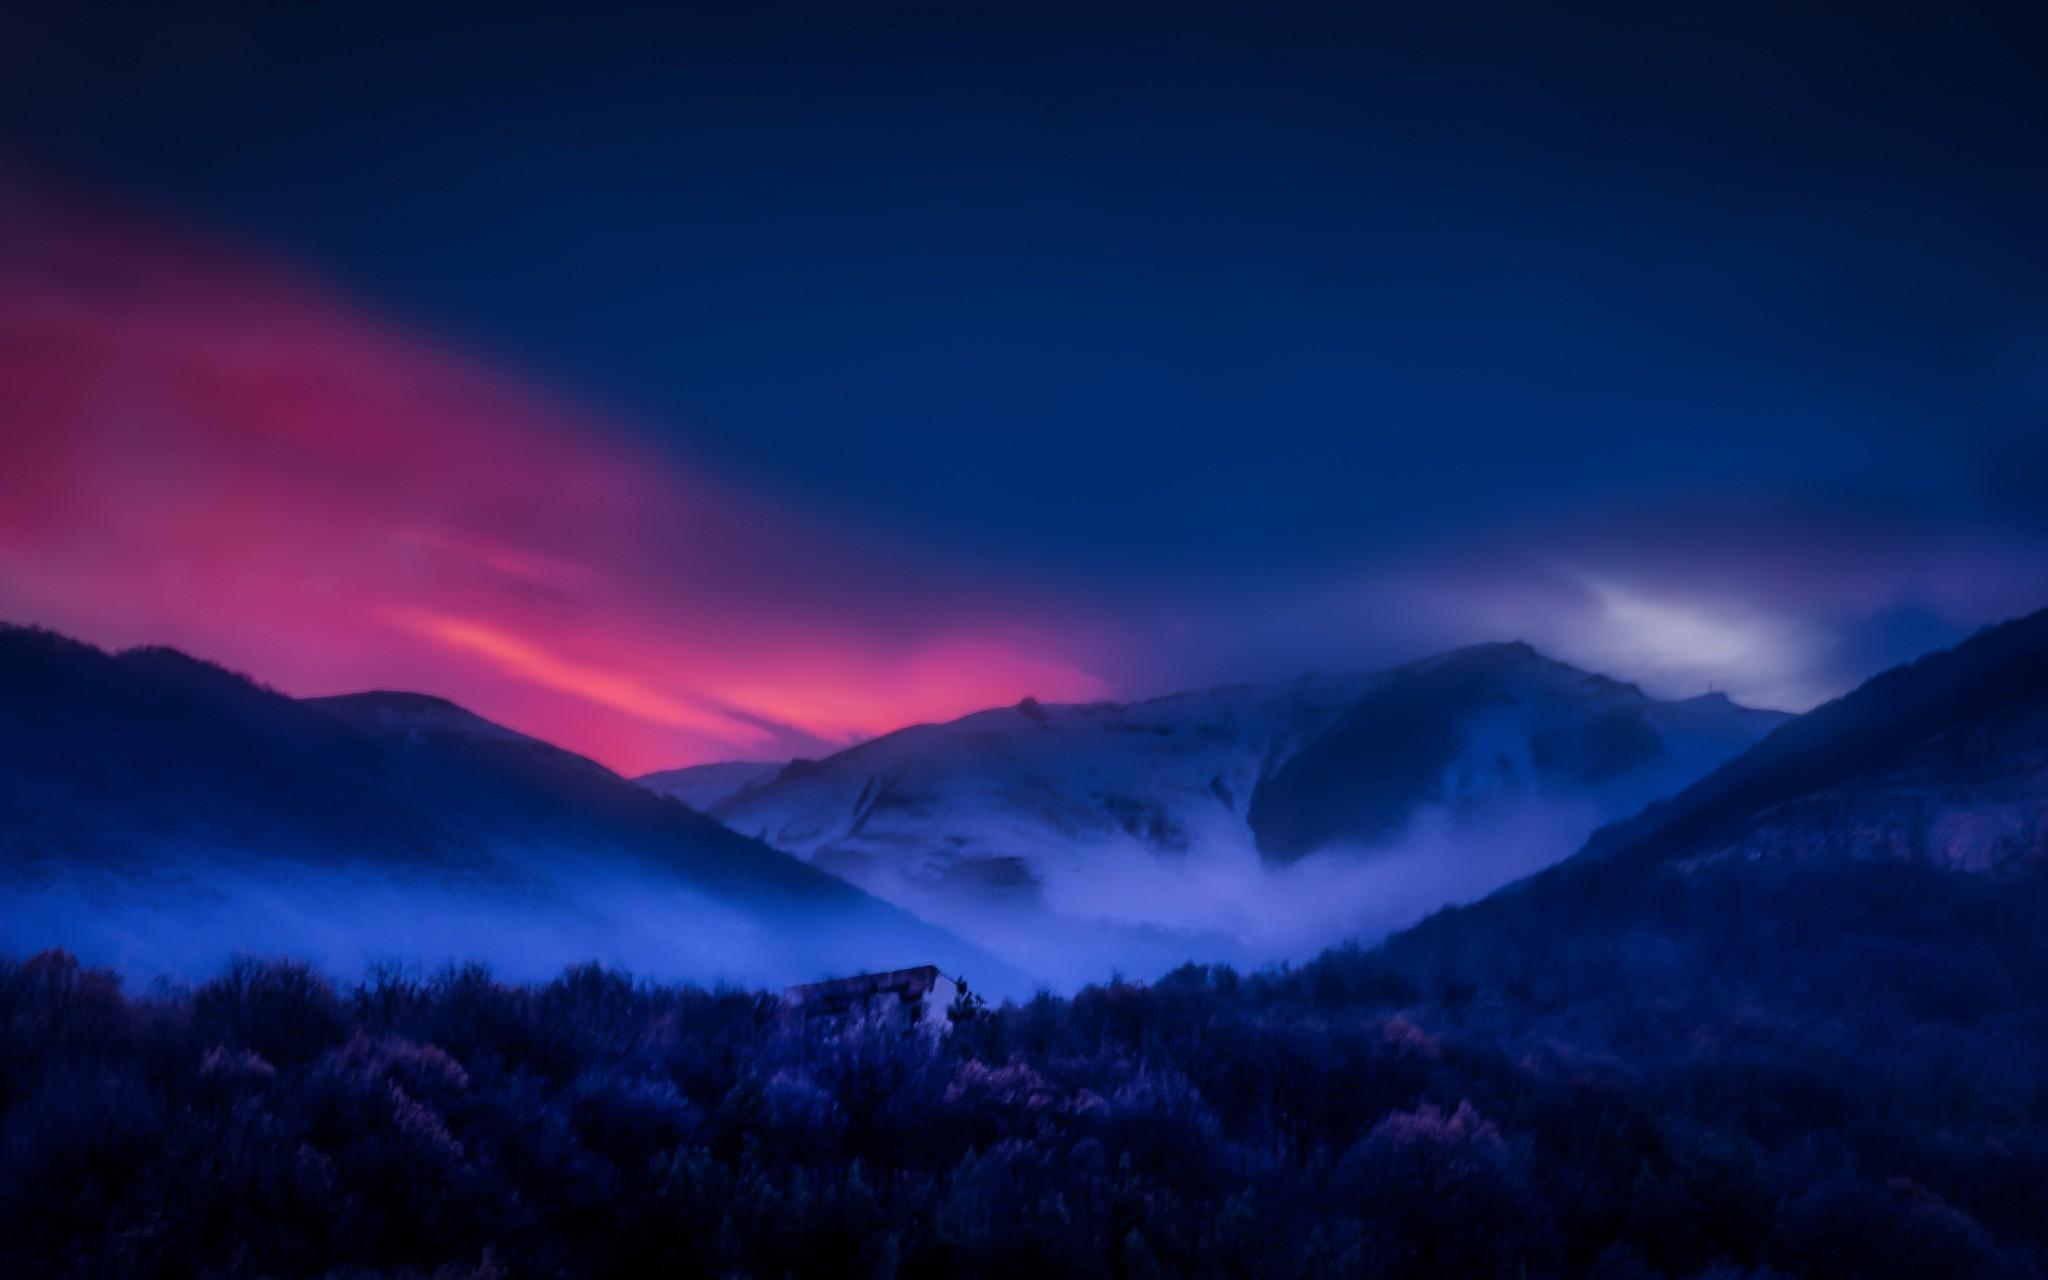 General 2048x1280 nature landscape Armenia mountains sunset forest mist snowy peak sky trees